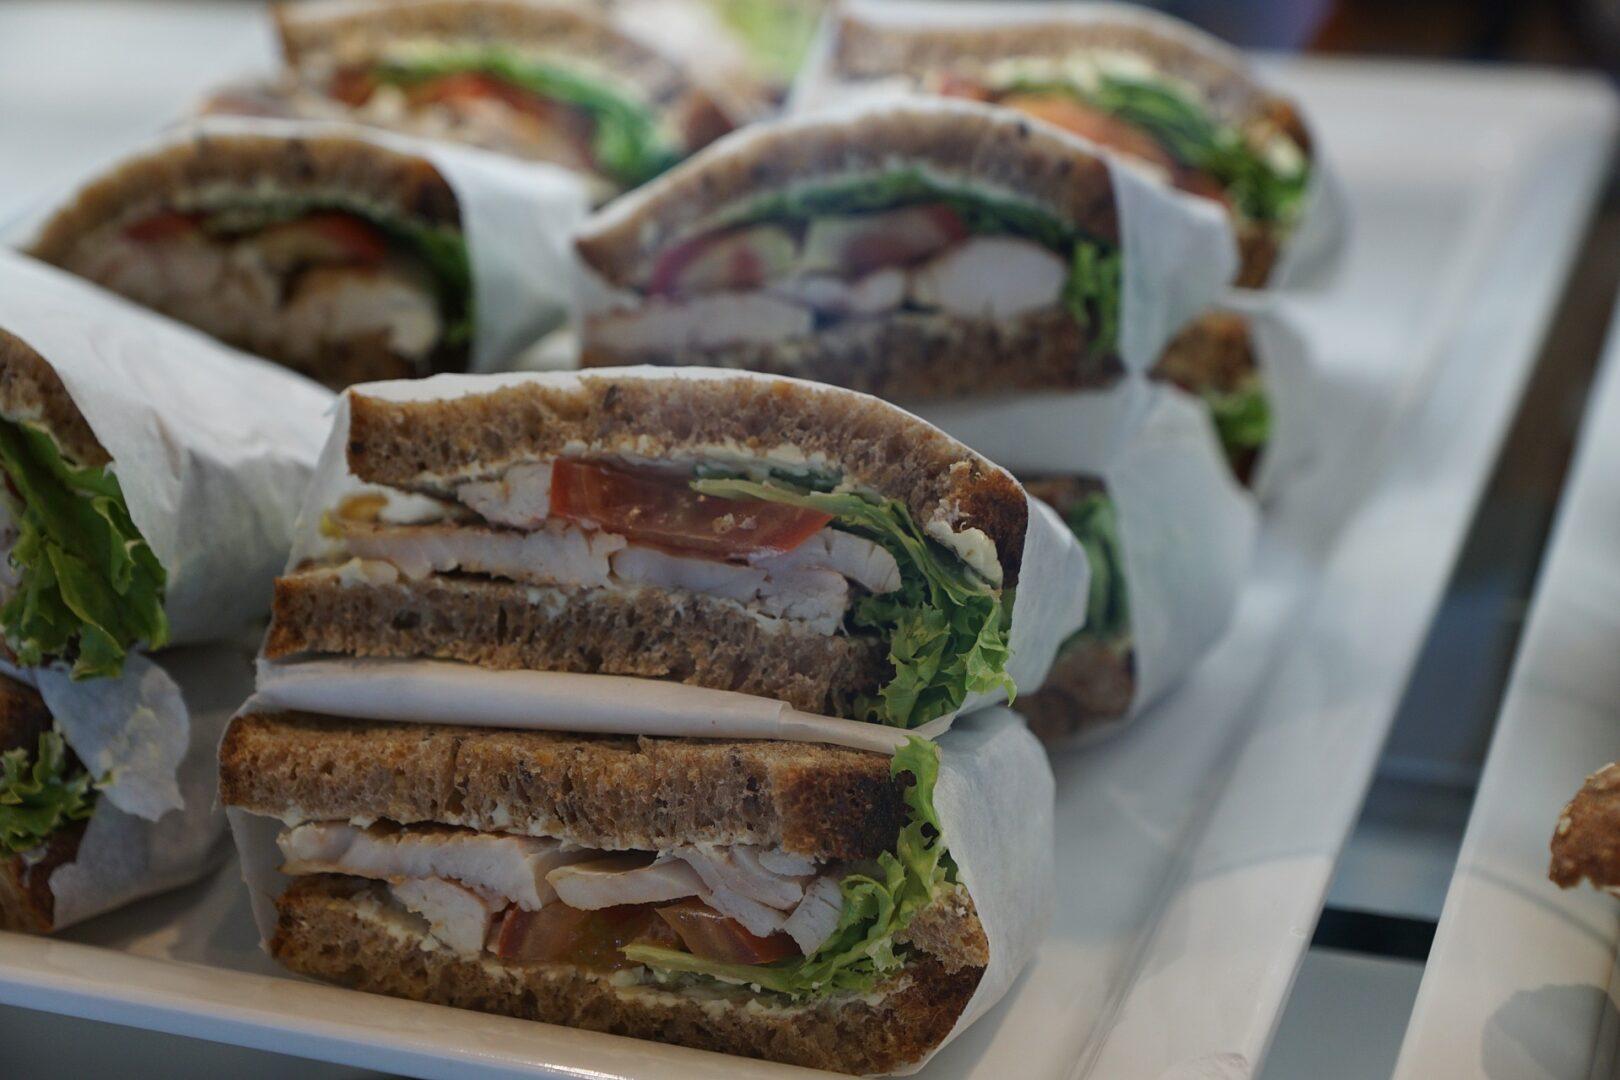 Comida: un sandwich o bocata cubano